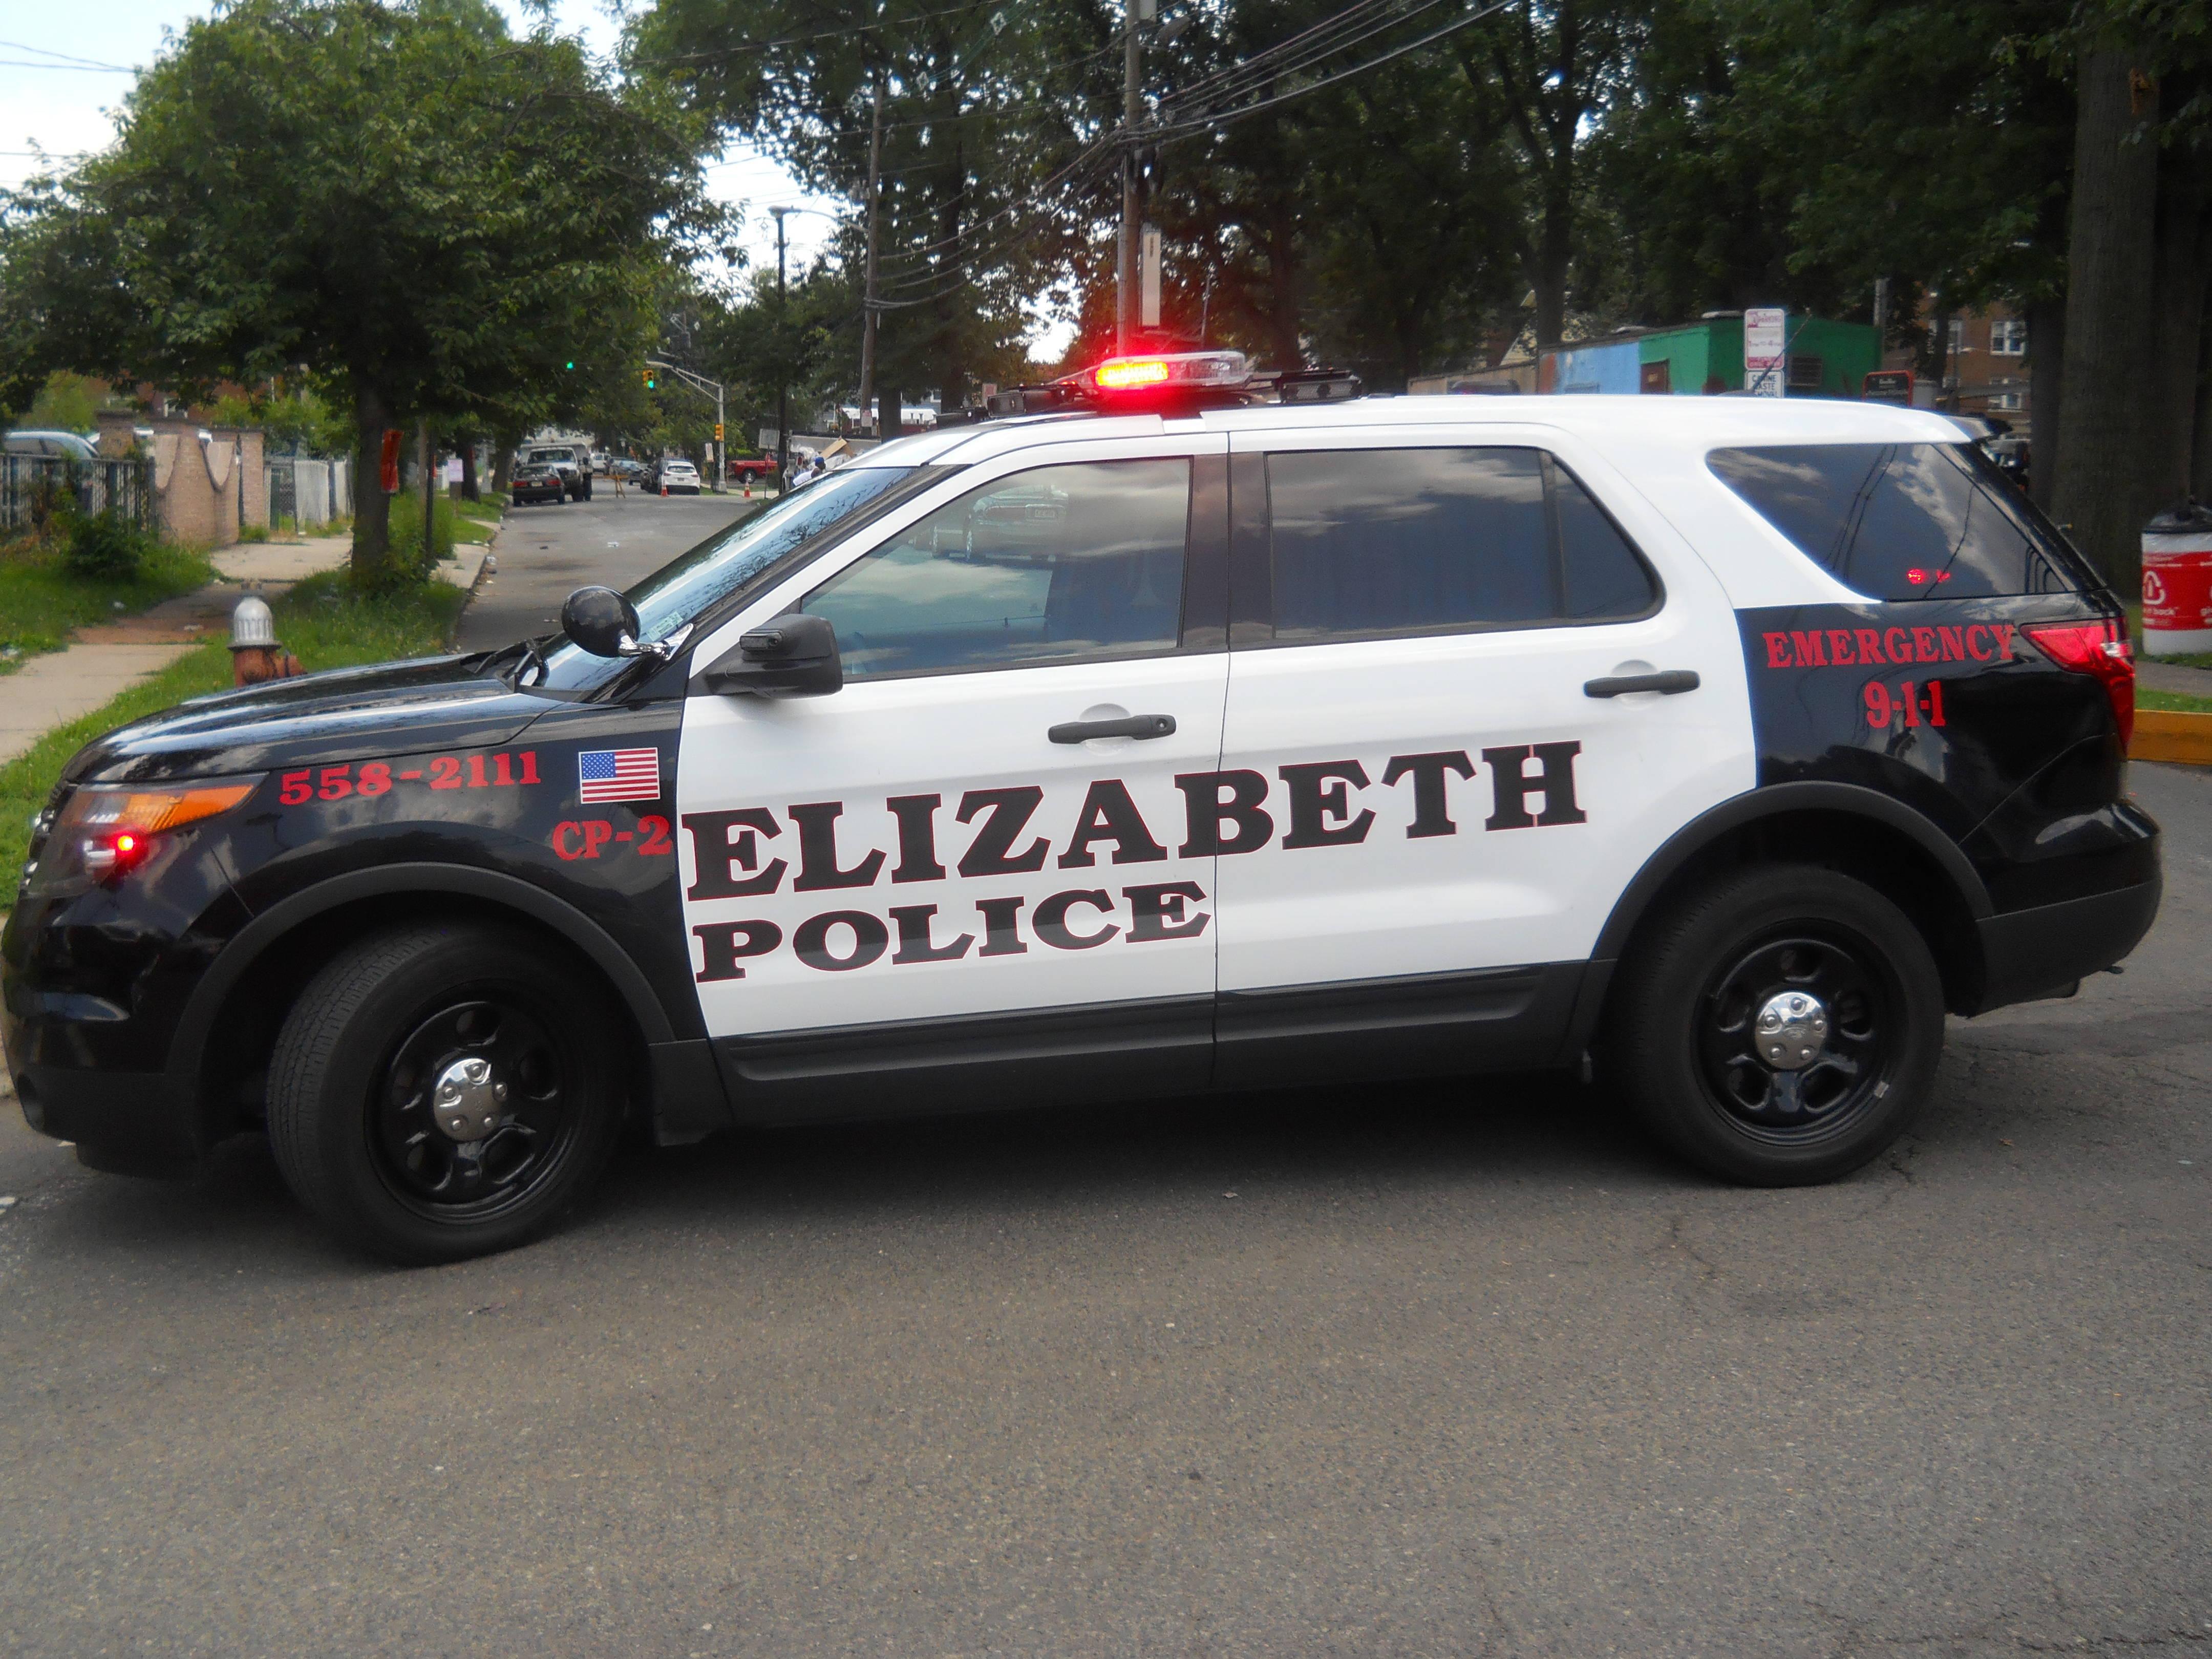 9c38dfc5f79bb1cccd53_Police_Car.jpg